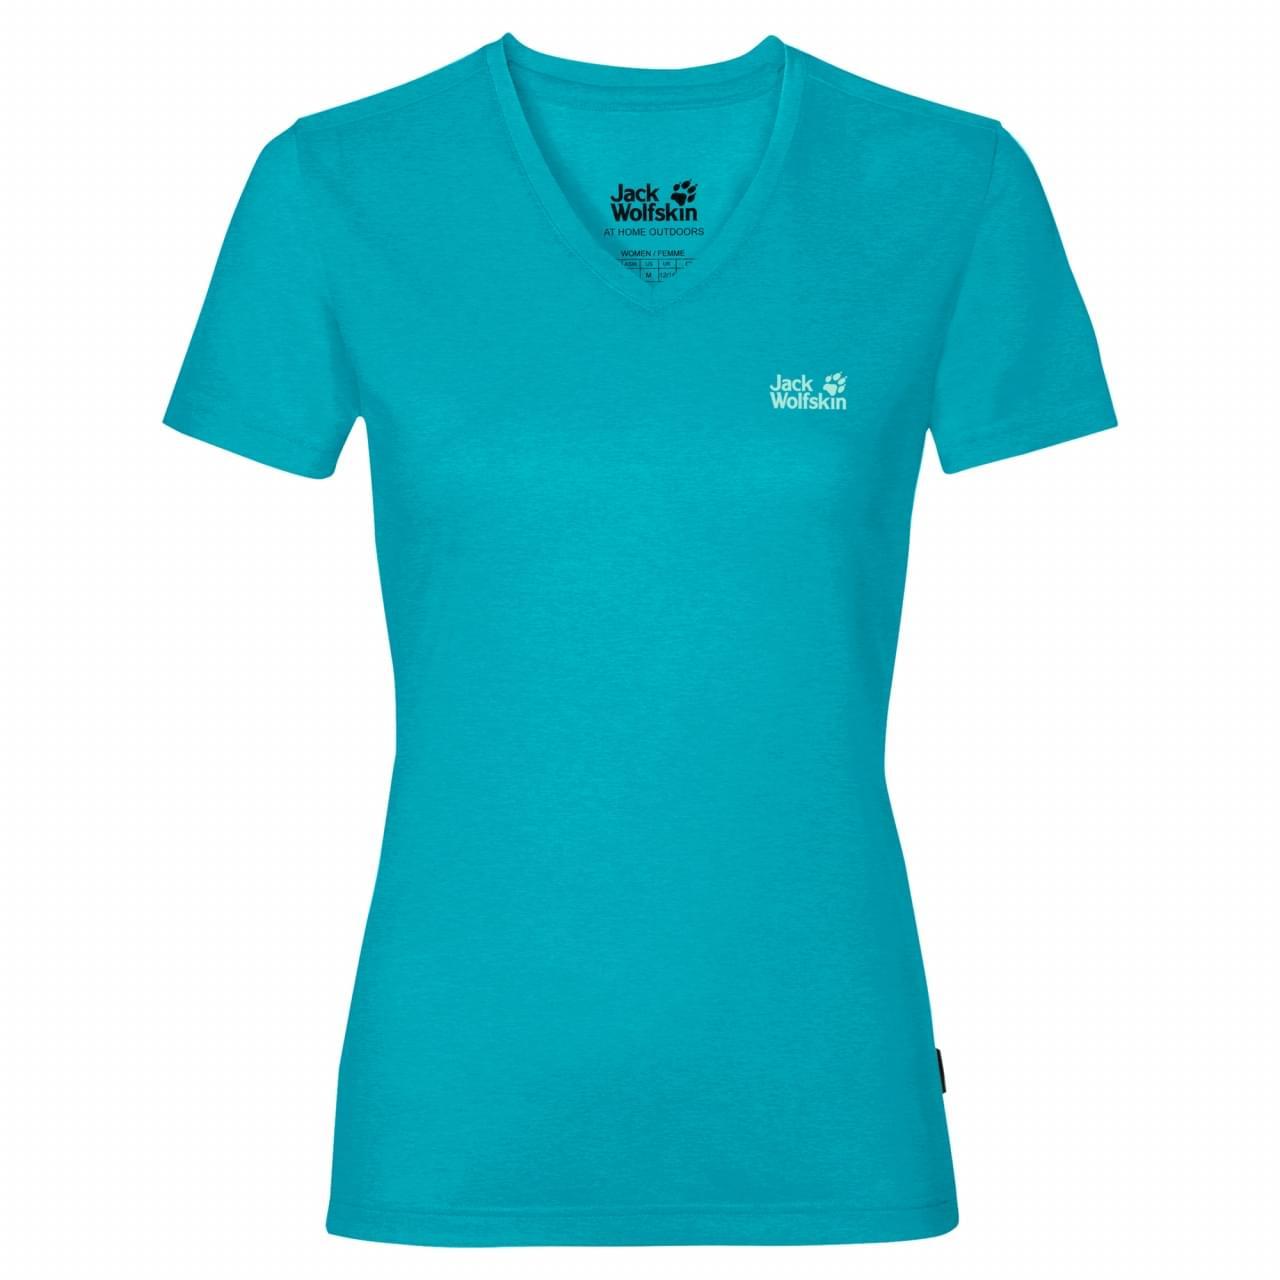 Jack Wolfskin Crosstrail T-shirt Dames Blauw